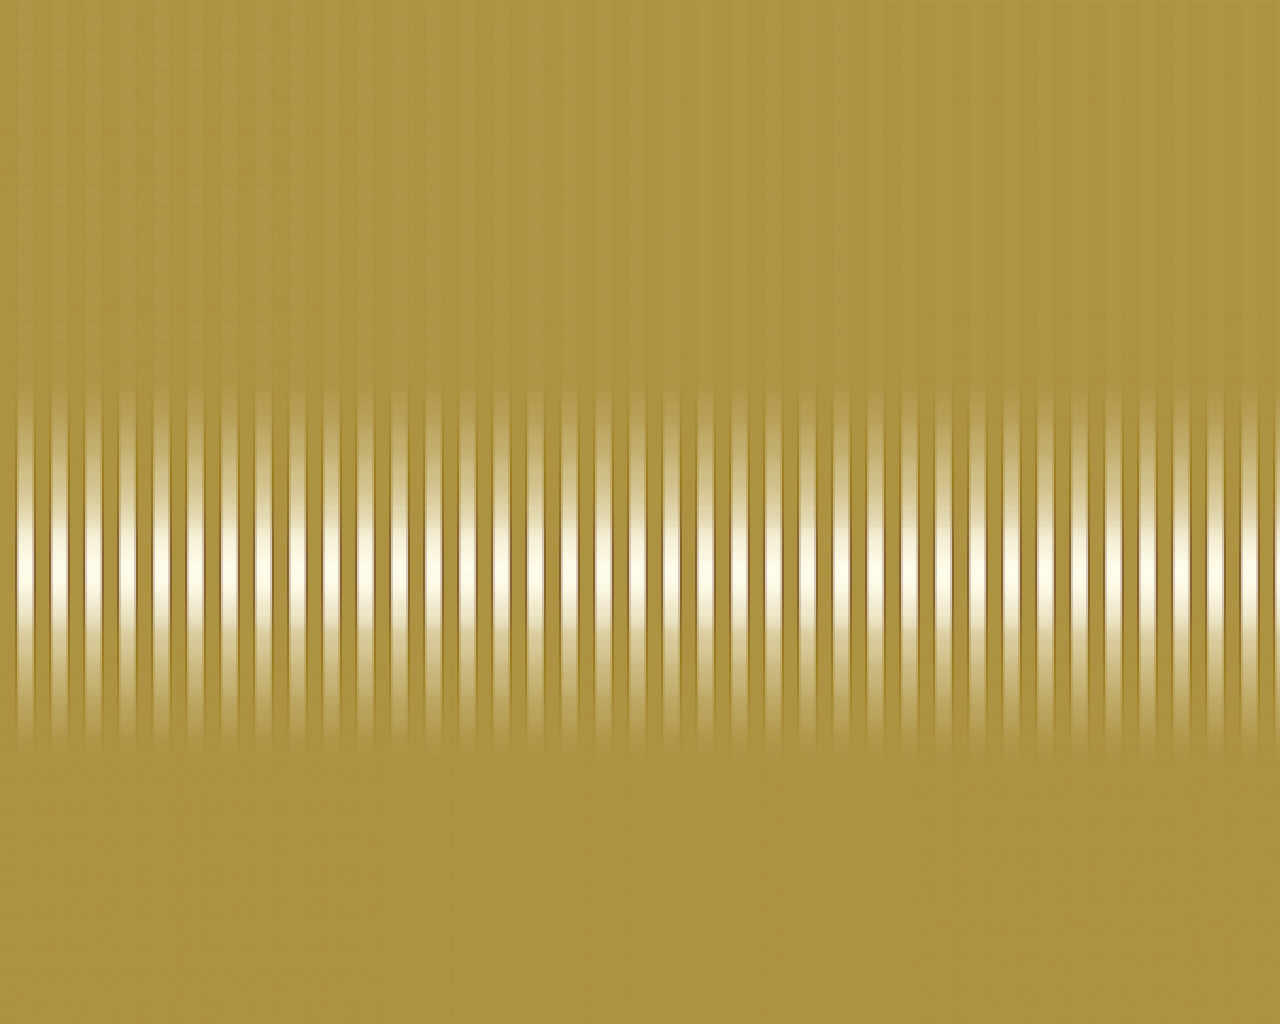 Sh yn design stripe wallpaper gold stripe for Gold wallpaper designs